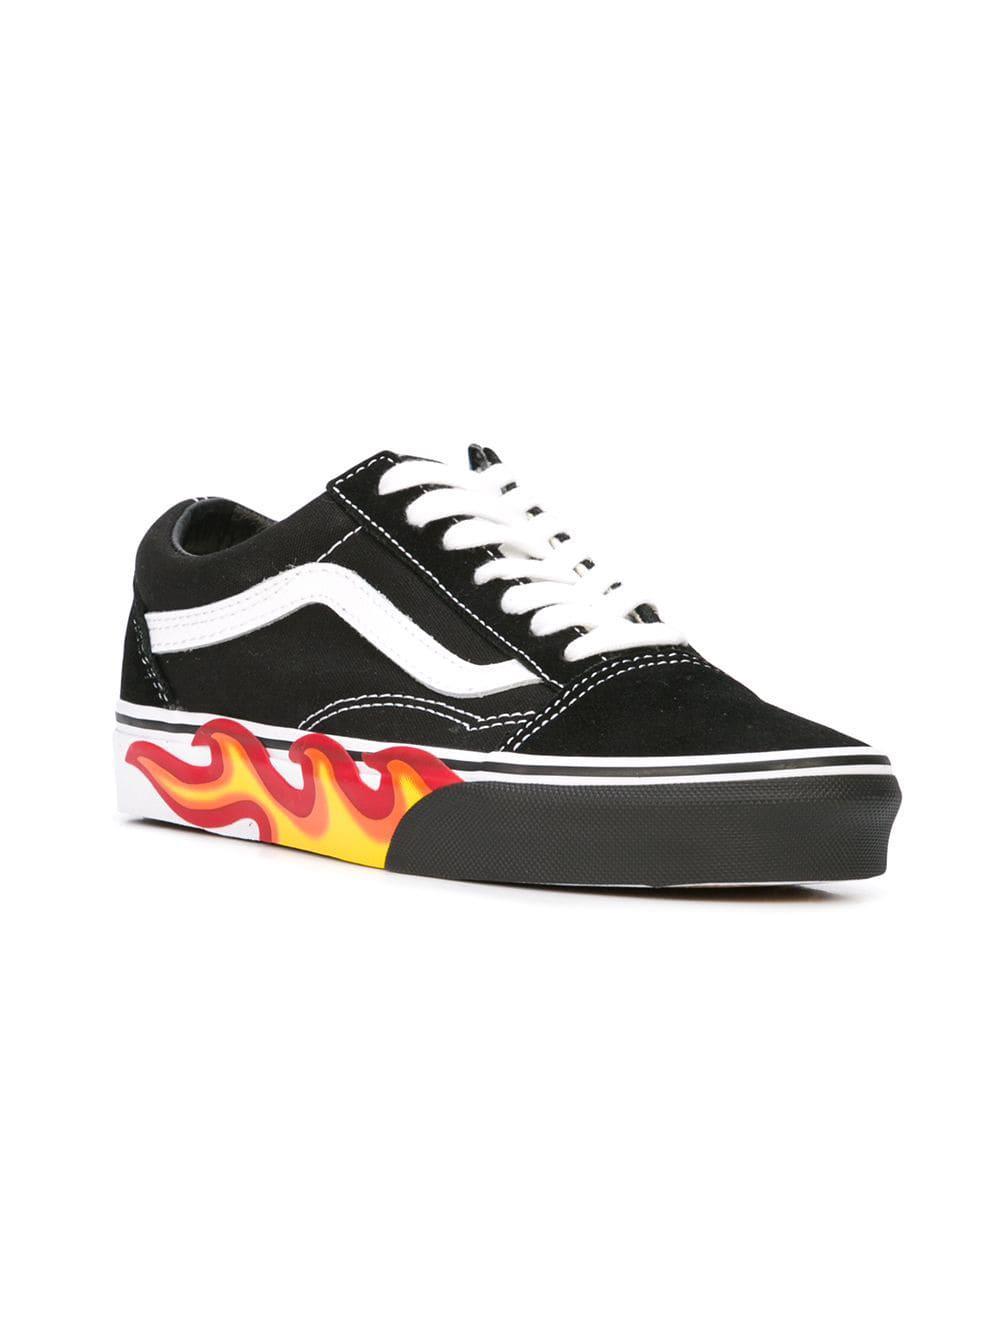 6811c0e87231cf Vans - Black Old Skool Flame Sneakers for Men - Lyst. View fullscreen